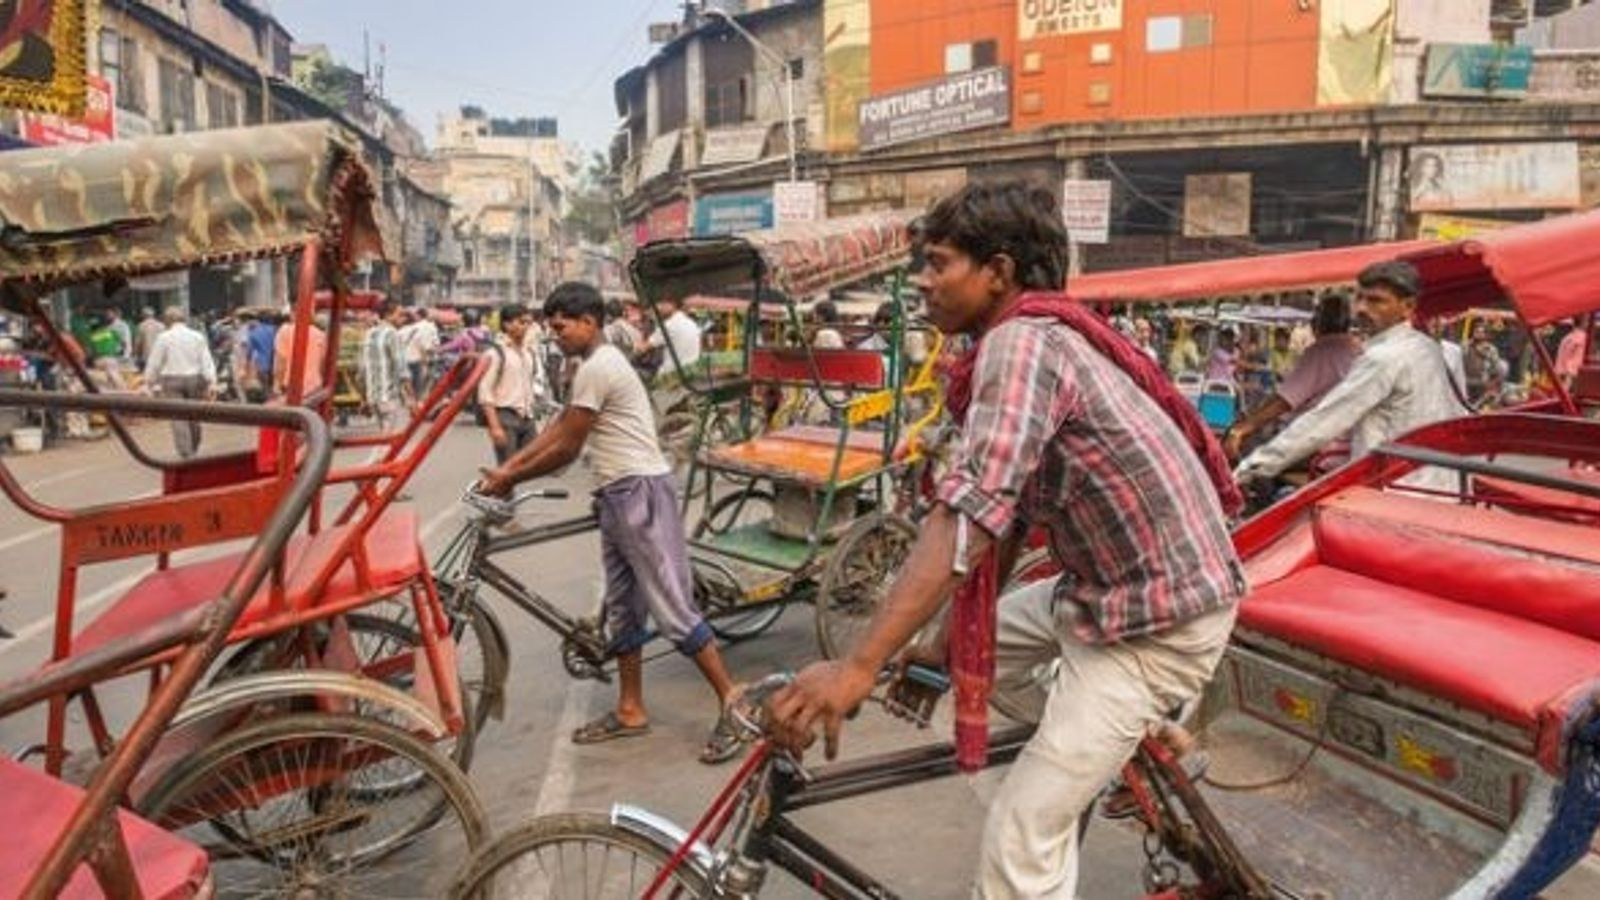 The busy quarter of Chandni Chowk, Delhi.